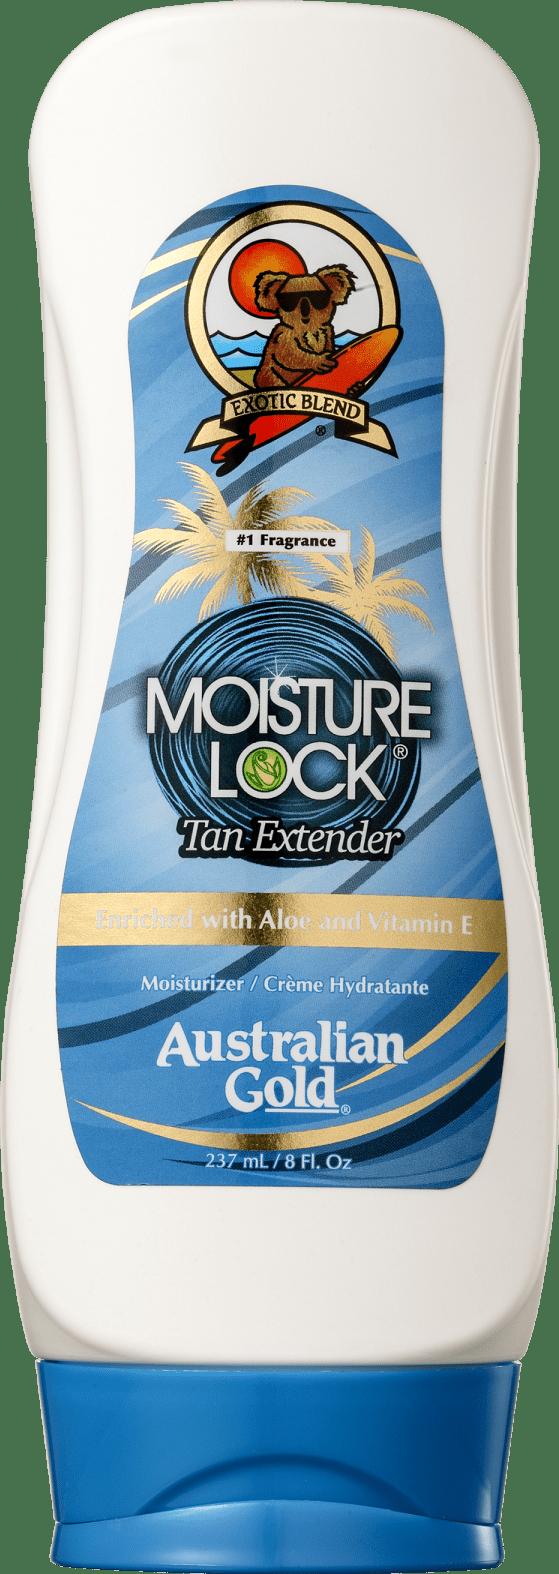 223c0de29 Australian Gold Moisture Lock Tan Extender - Loção Pós-Sol 237ml